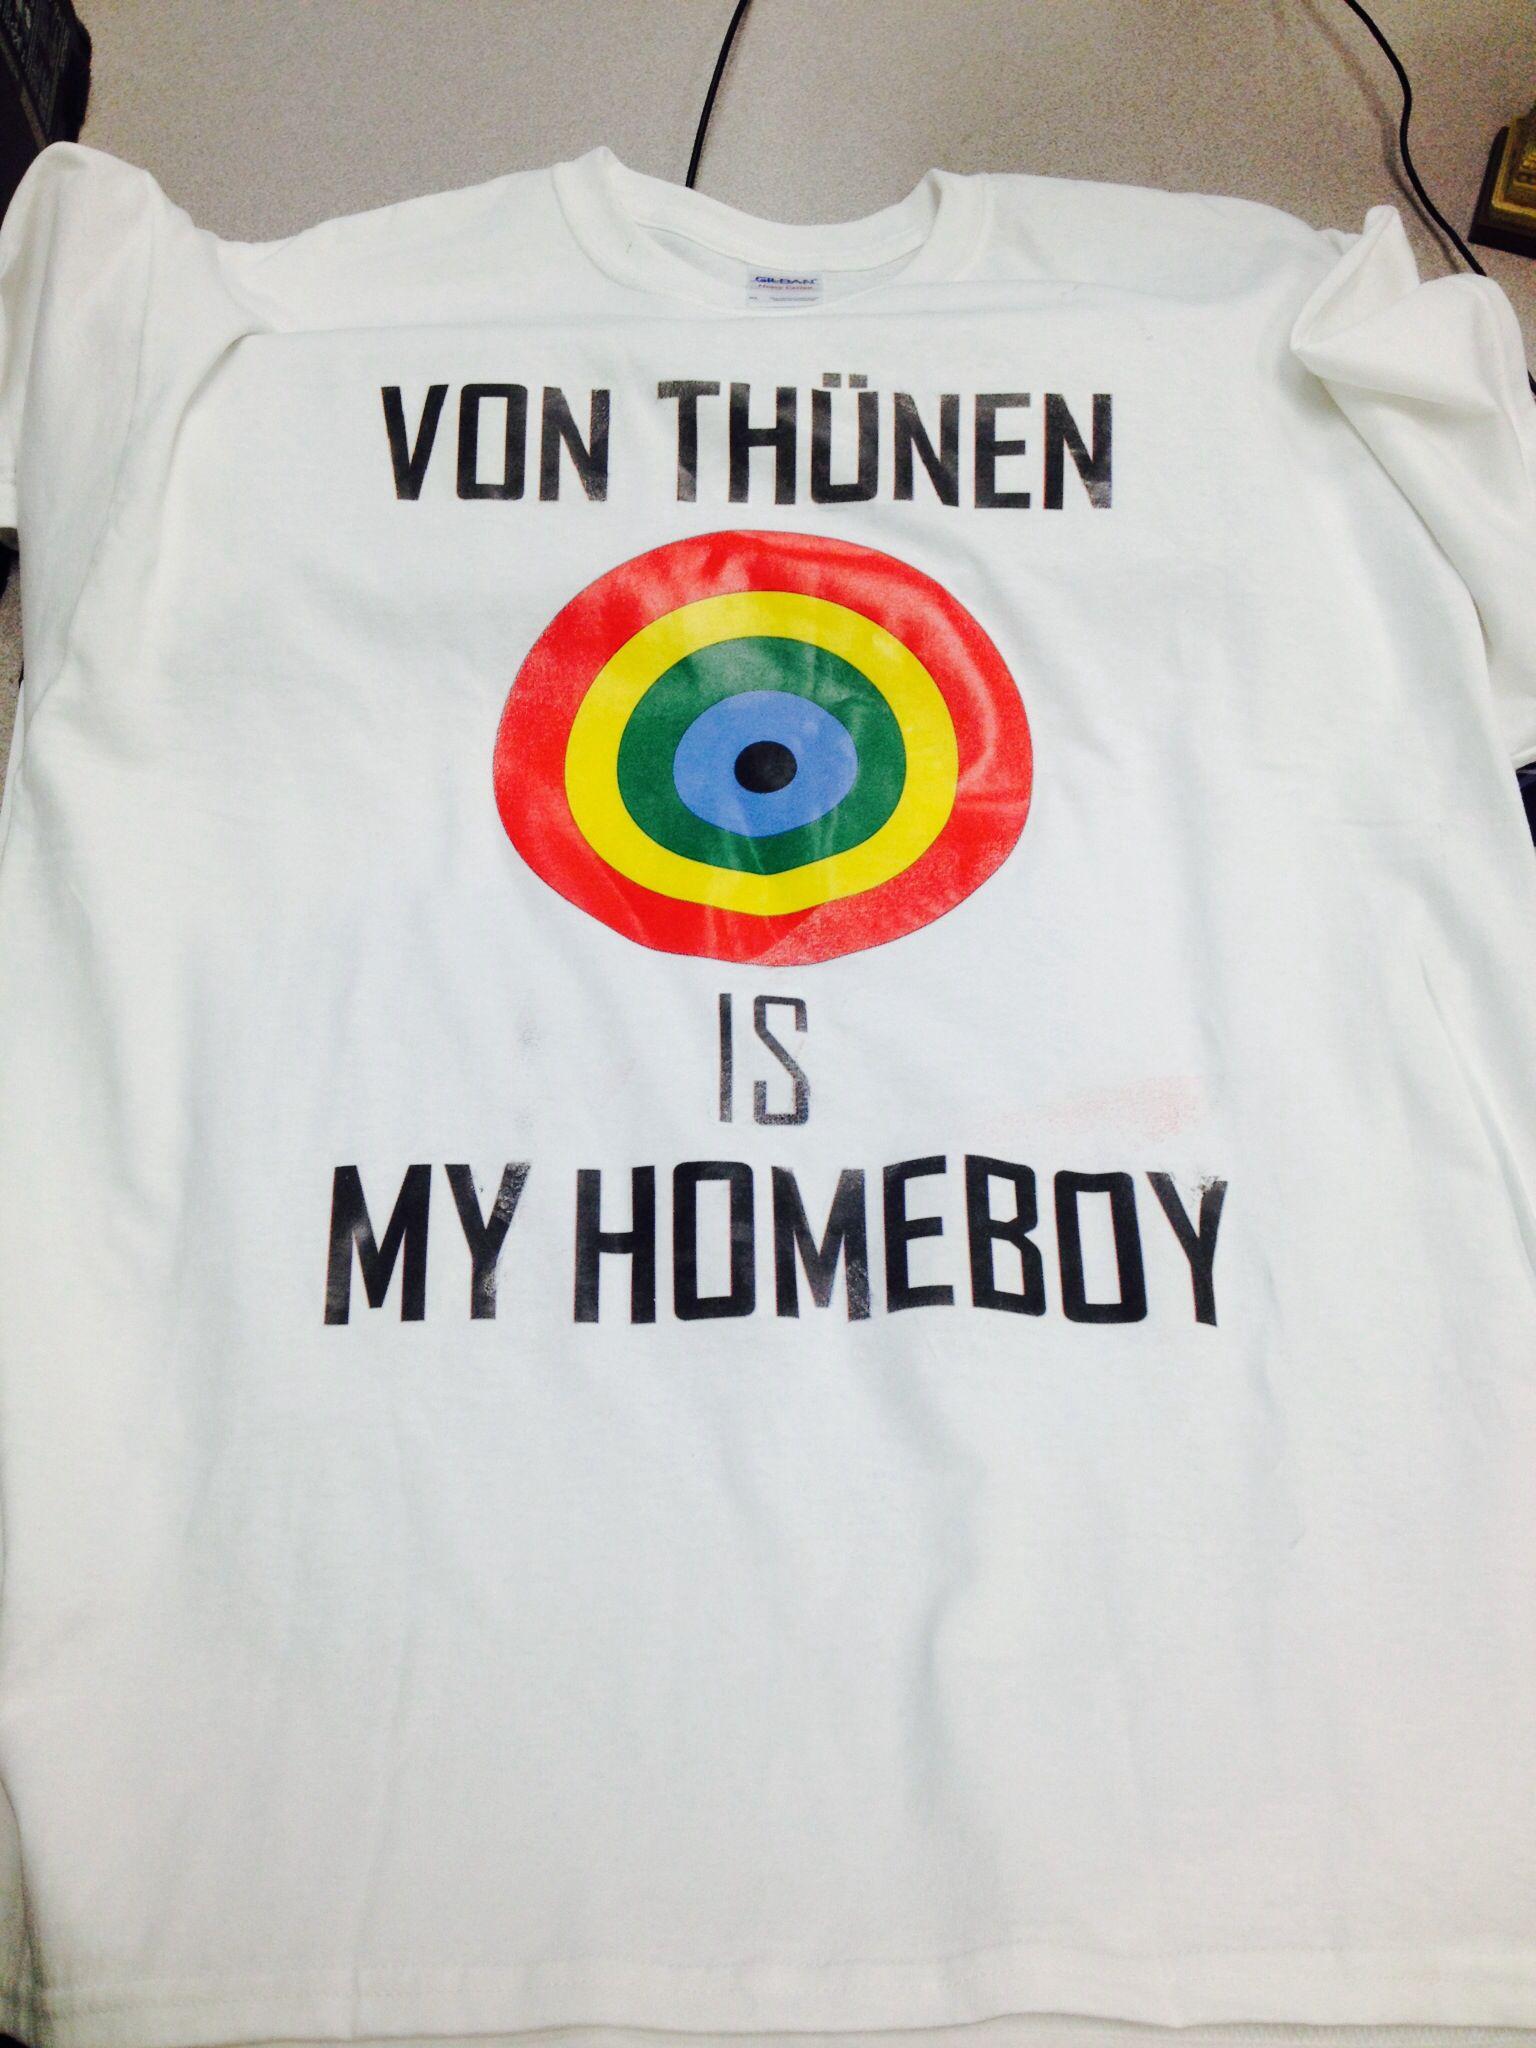 a9390c7f8 Von Thunen T-shirt from my kids Ap Human Geography, School Humor, Work